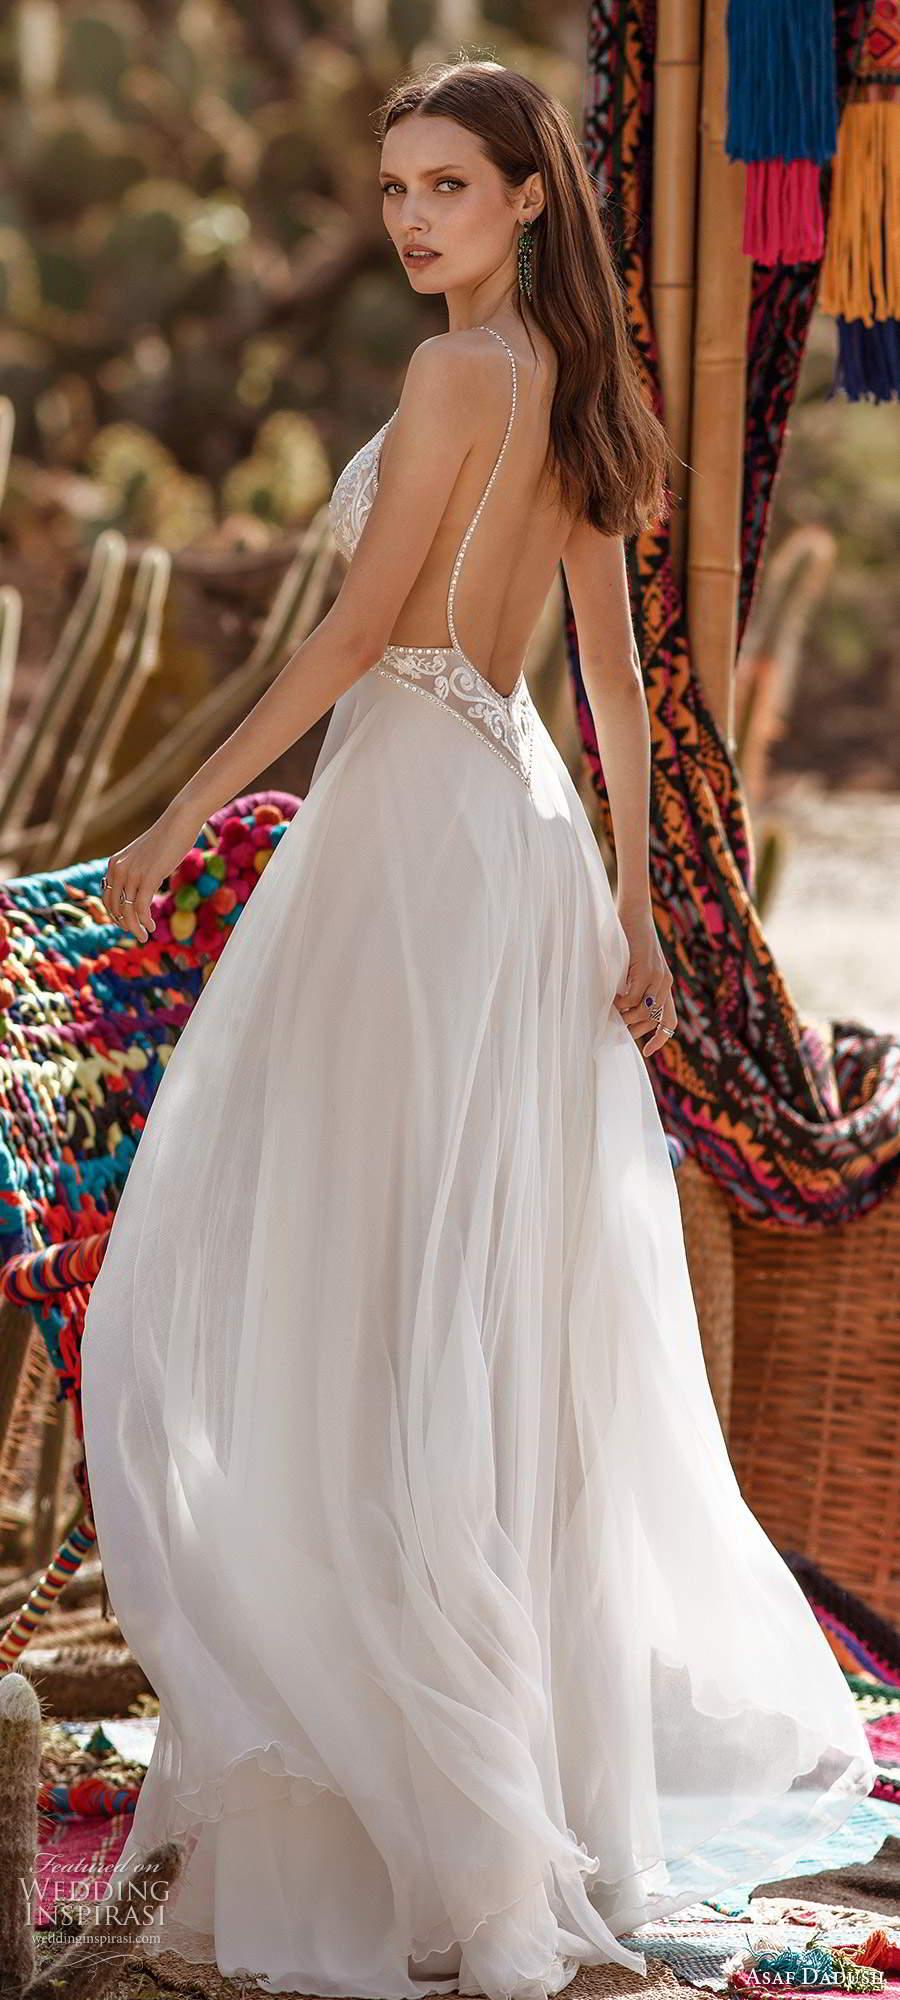 asaf dadush 2020 bridal sleeveless thin straps plunging v neckline heavily embellished bodice clean skirt a line wedding dress chapel train low back (1) bv